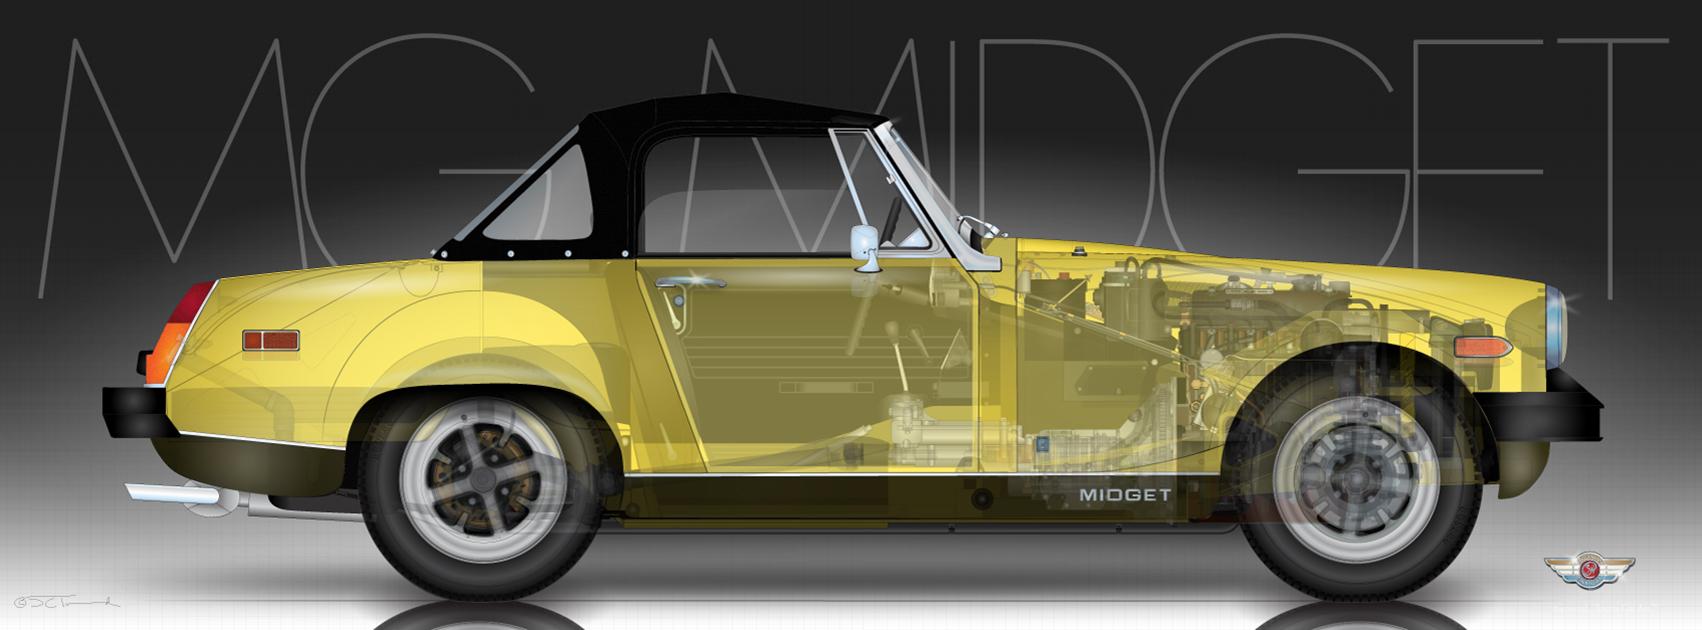 mg midget 1500 sports car art. Black Bedroom Furniture Sets. Home Design Ideas